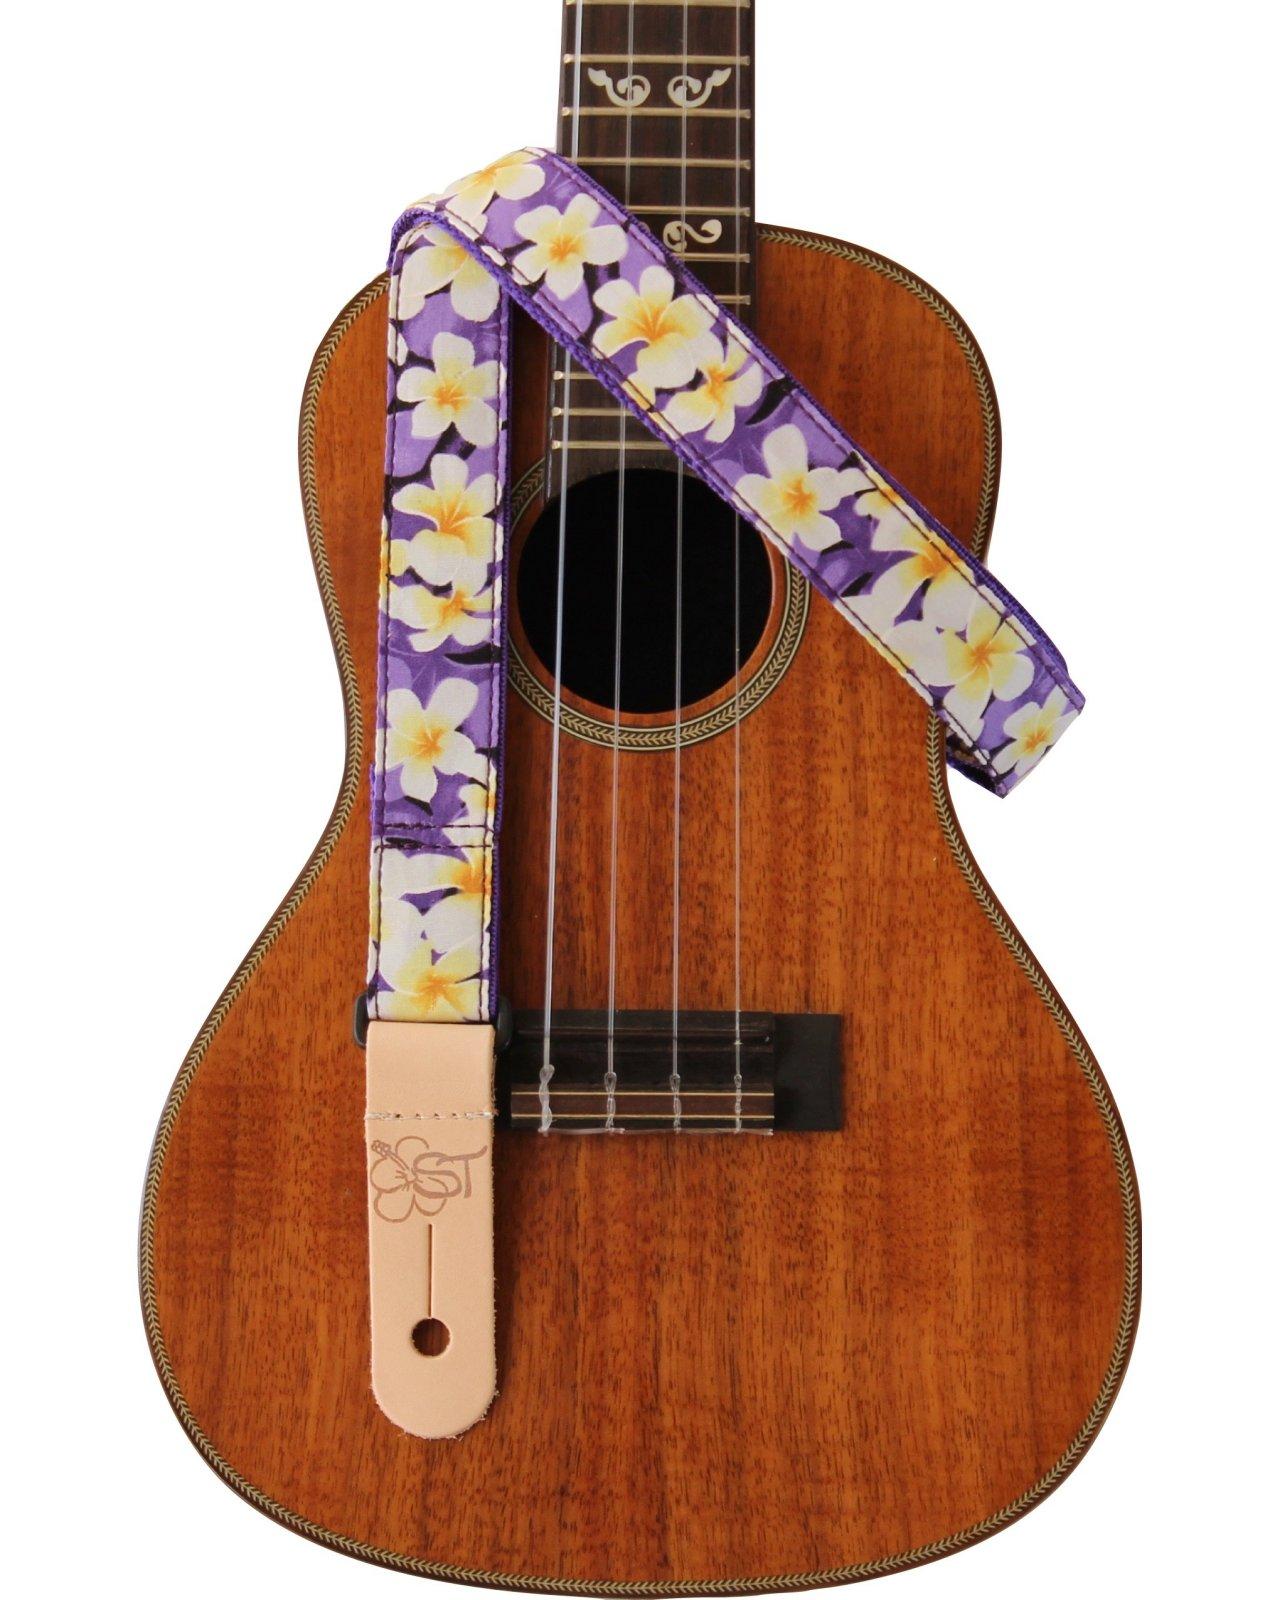 Sherrin's Threads 1 Hawaiian Print Ukulele Strap - Purple Plumeria